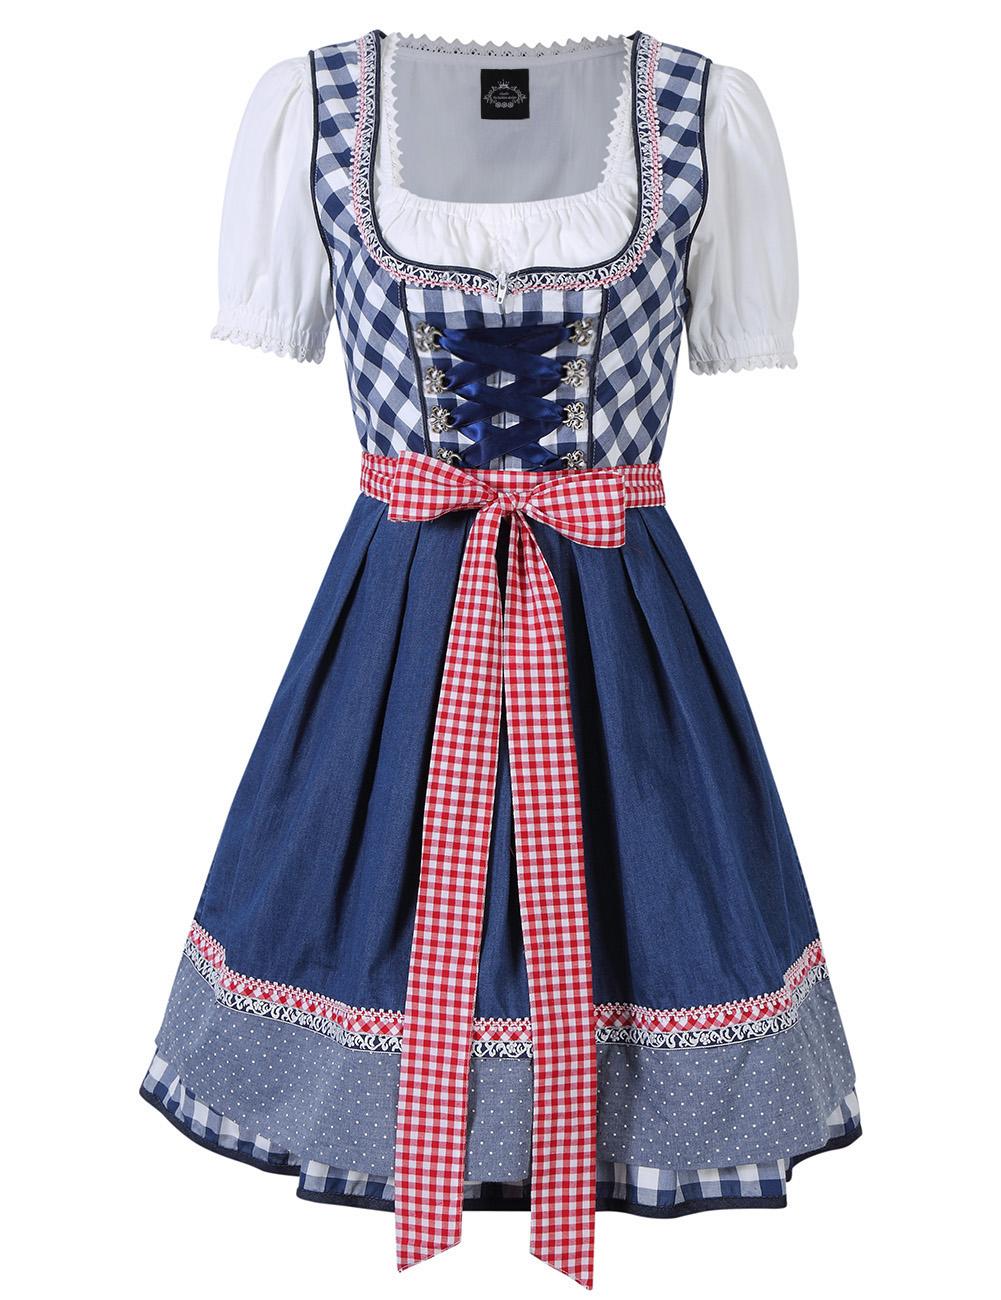 [EU Direct] Women's Plaid Short Sleeve Triple Splicing Dress Suit for Dresses Oktoberfest Holiday Costumes